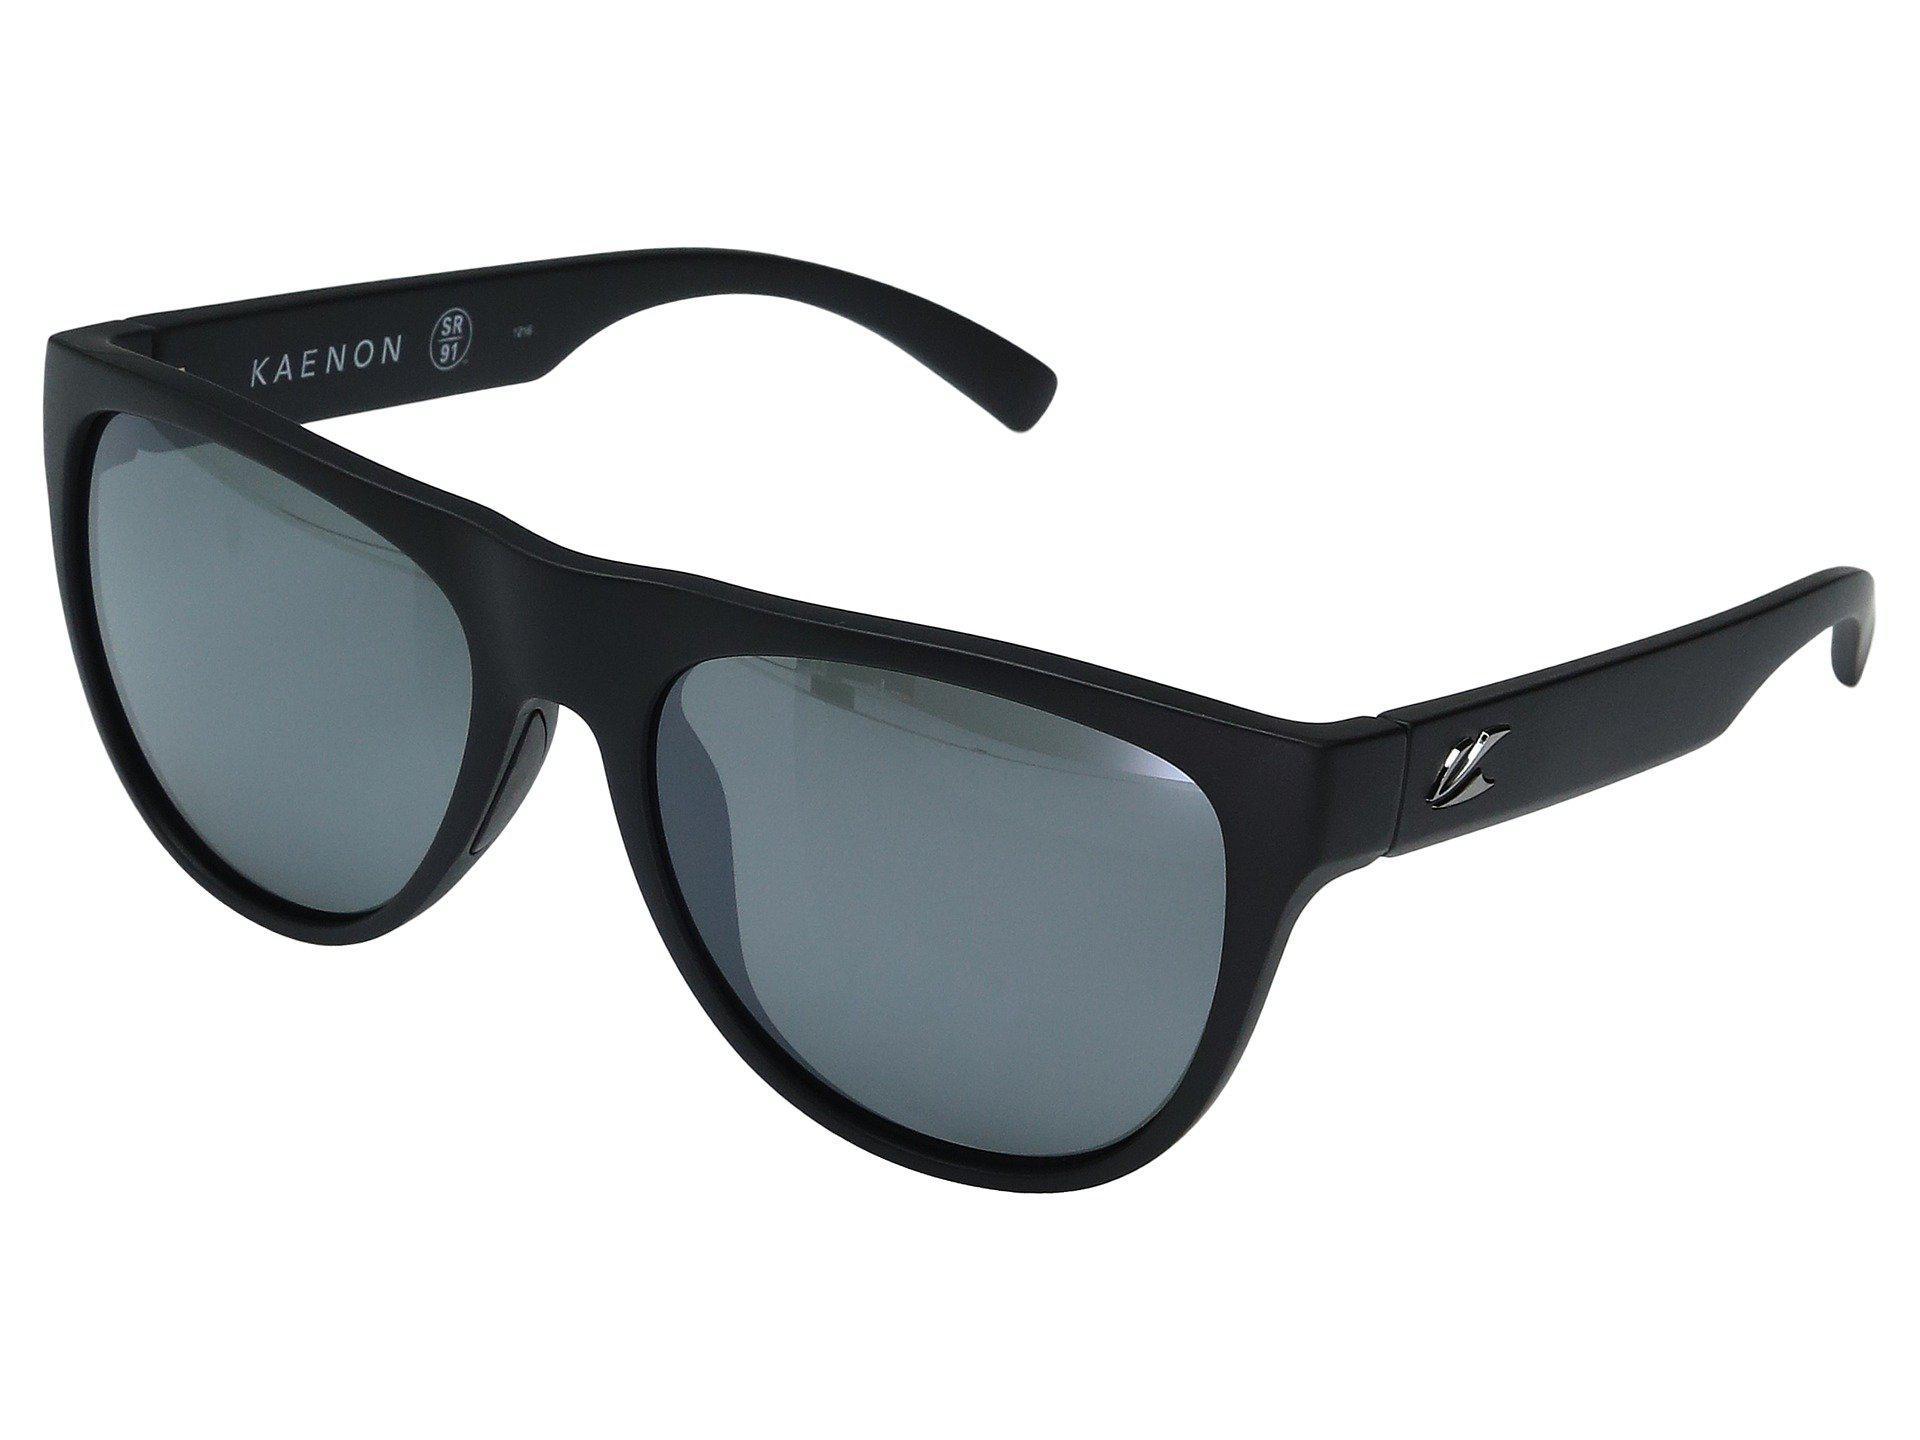 b4f2136ca54 Kaenon - Black Moonstone (matte Tortoise brown 12 Polarized) Sport  Sunglasses - Lyst. View fullscreen